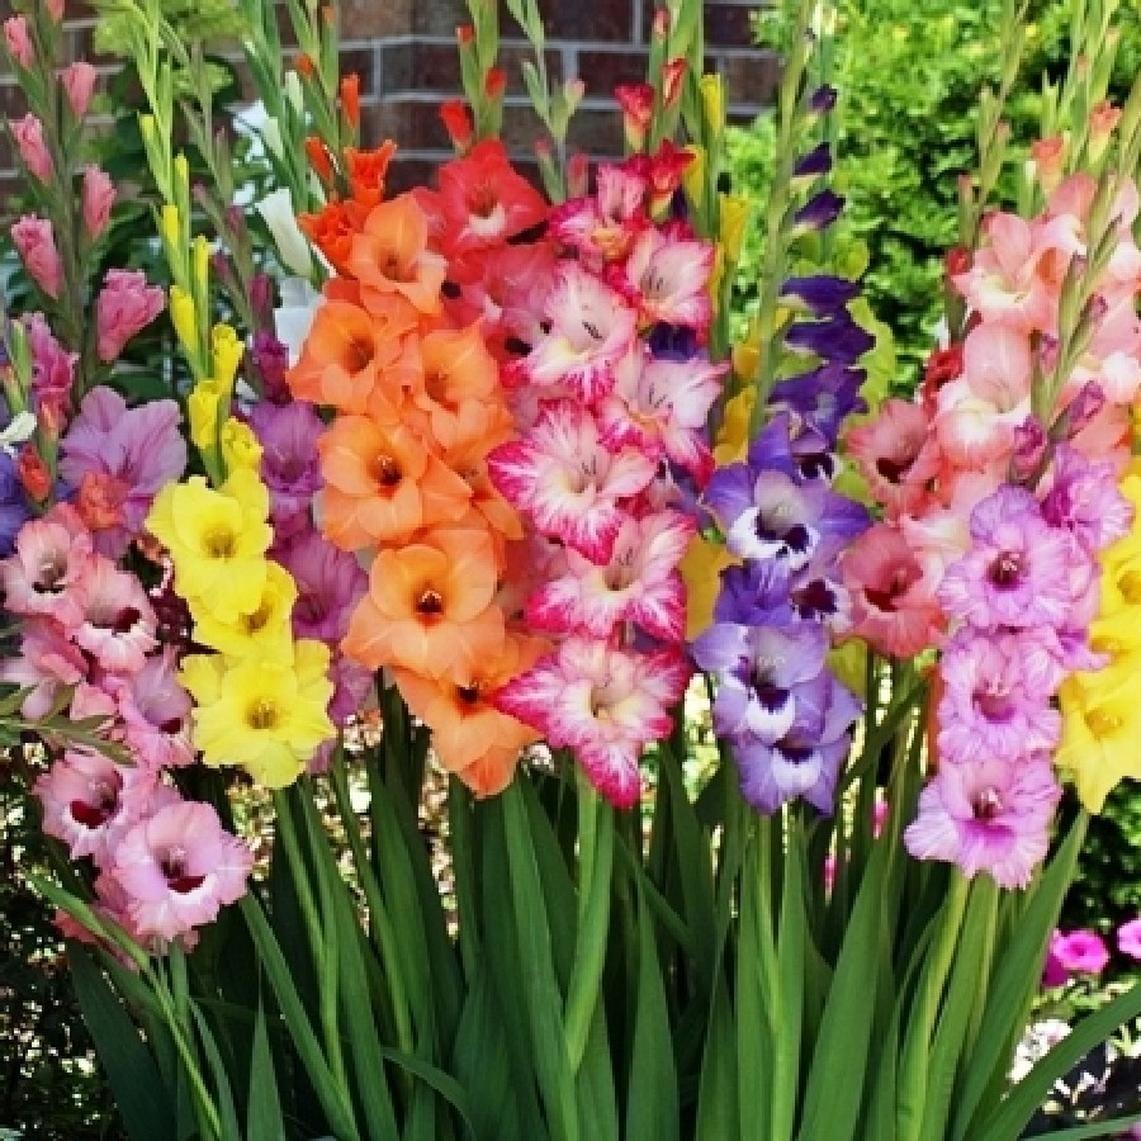 Gladiolus Flower Bulbs Rainbow Mix Gladiolus Flower Bulb Flowers Gladiolus Bulbs